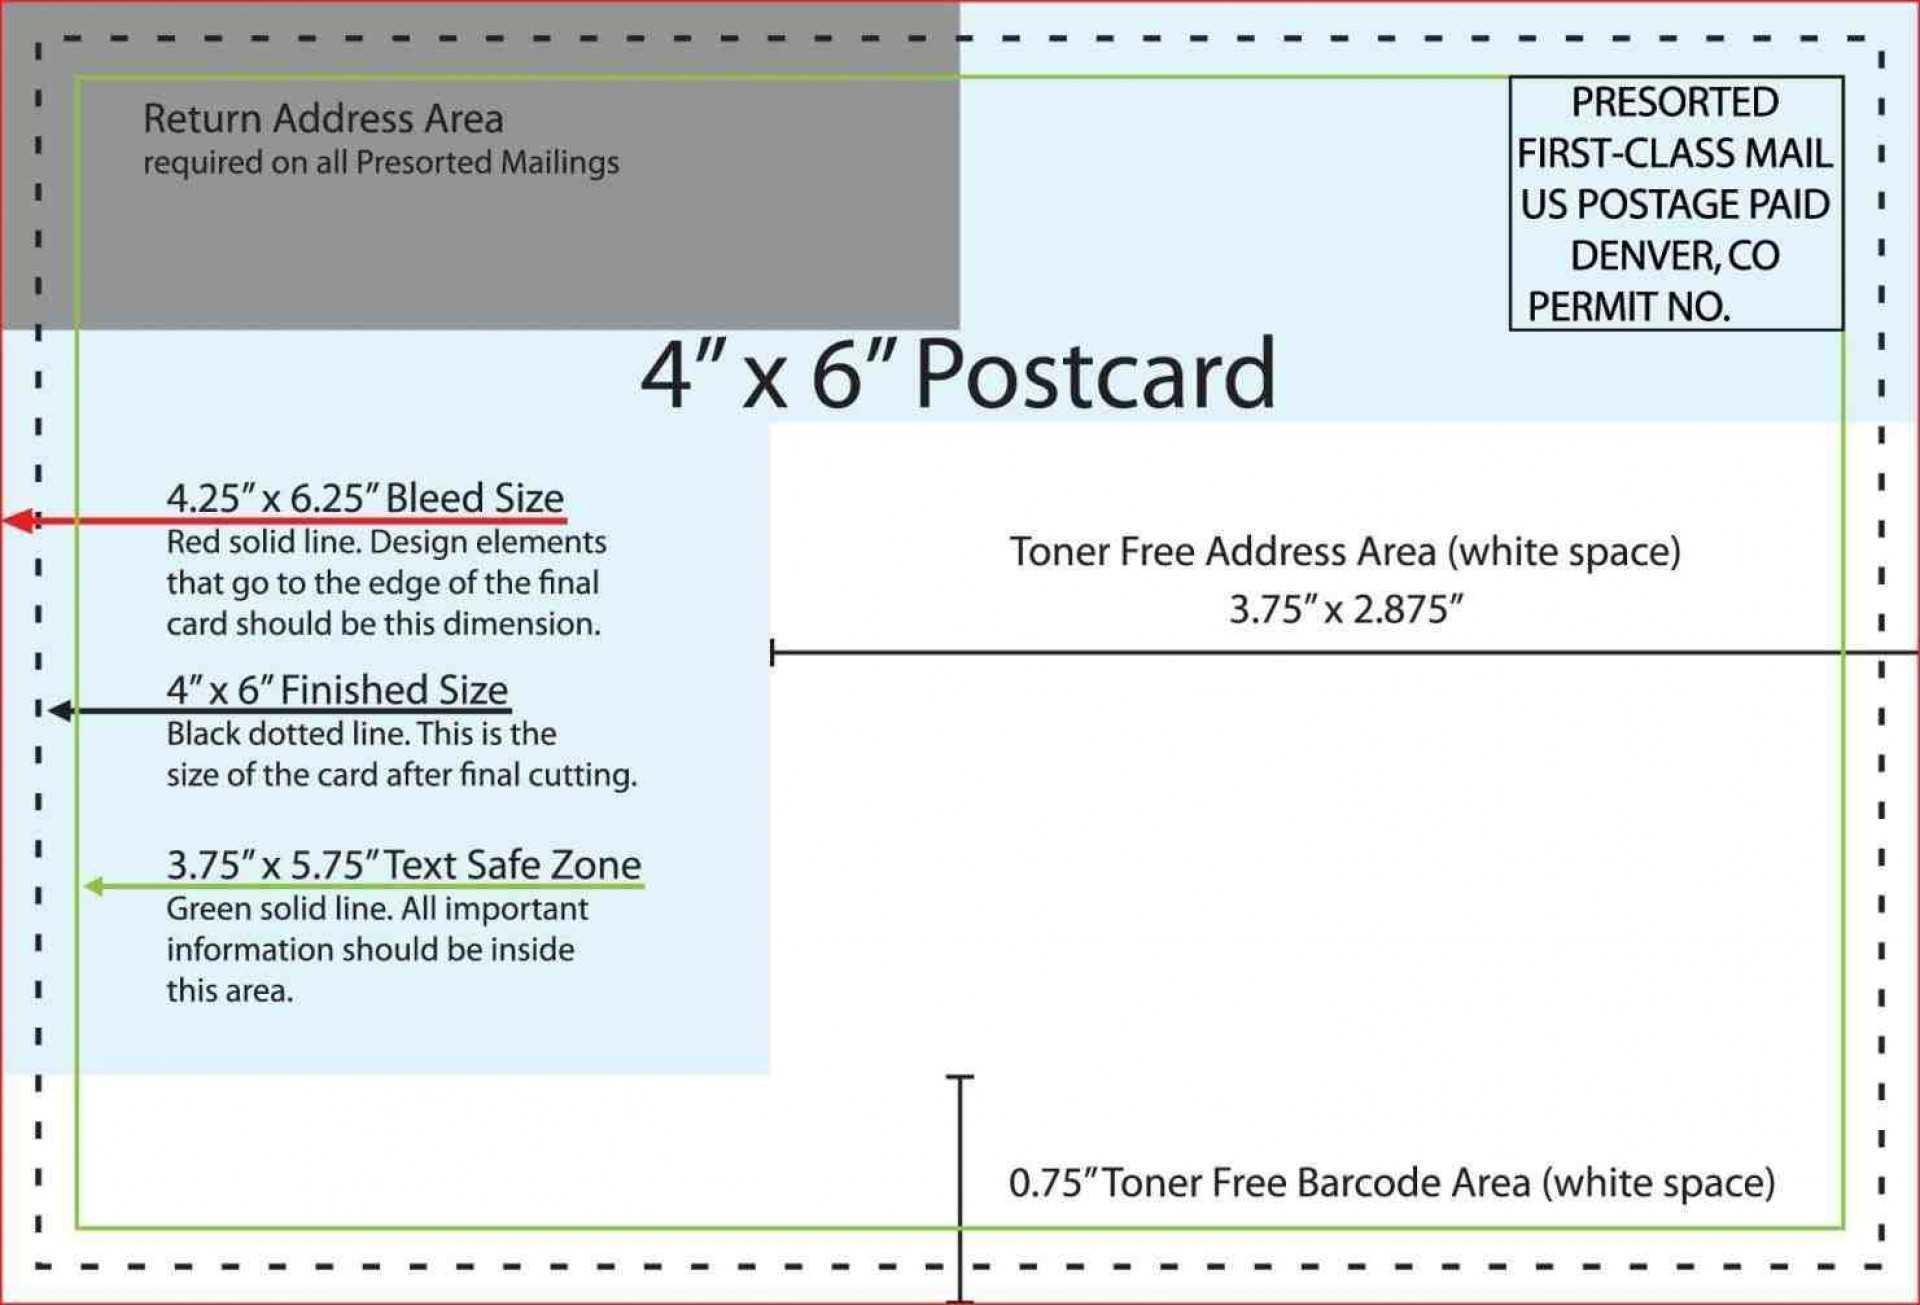 001 Template Ideas X Templates 4X6 Card Resume Postcard With Microsoft Word 4X6 Postcard Template